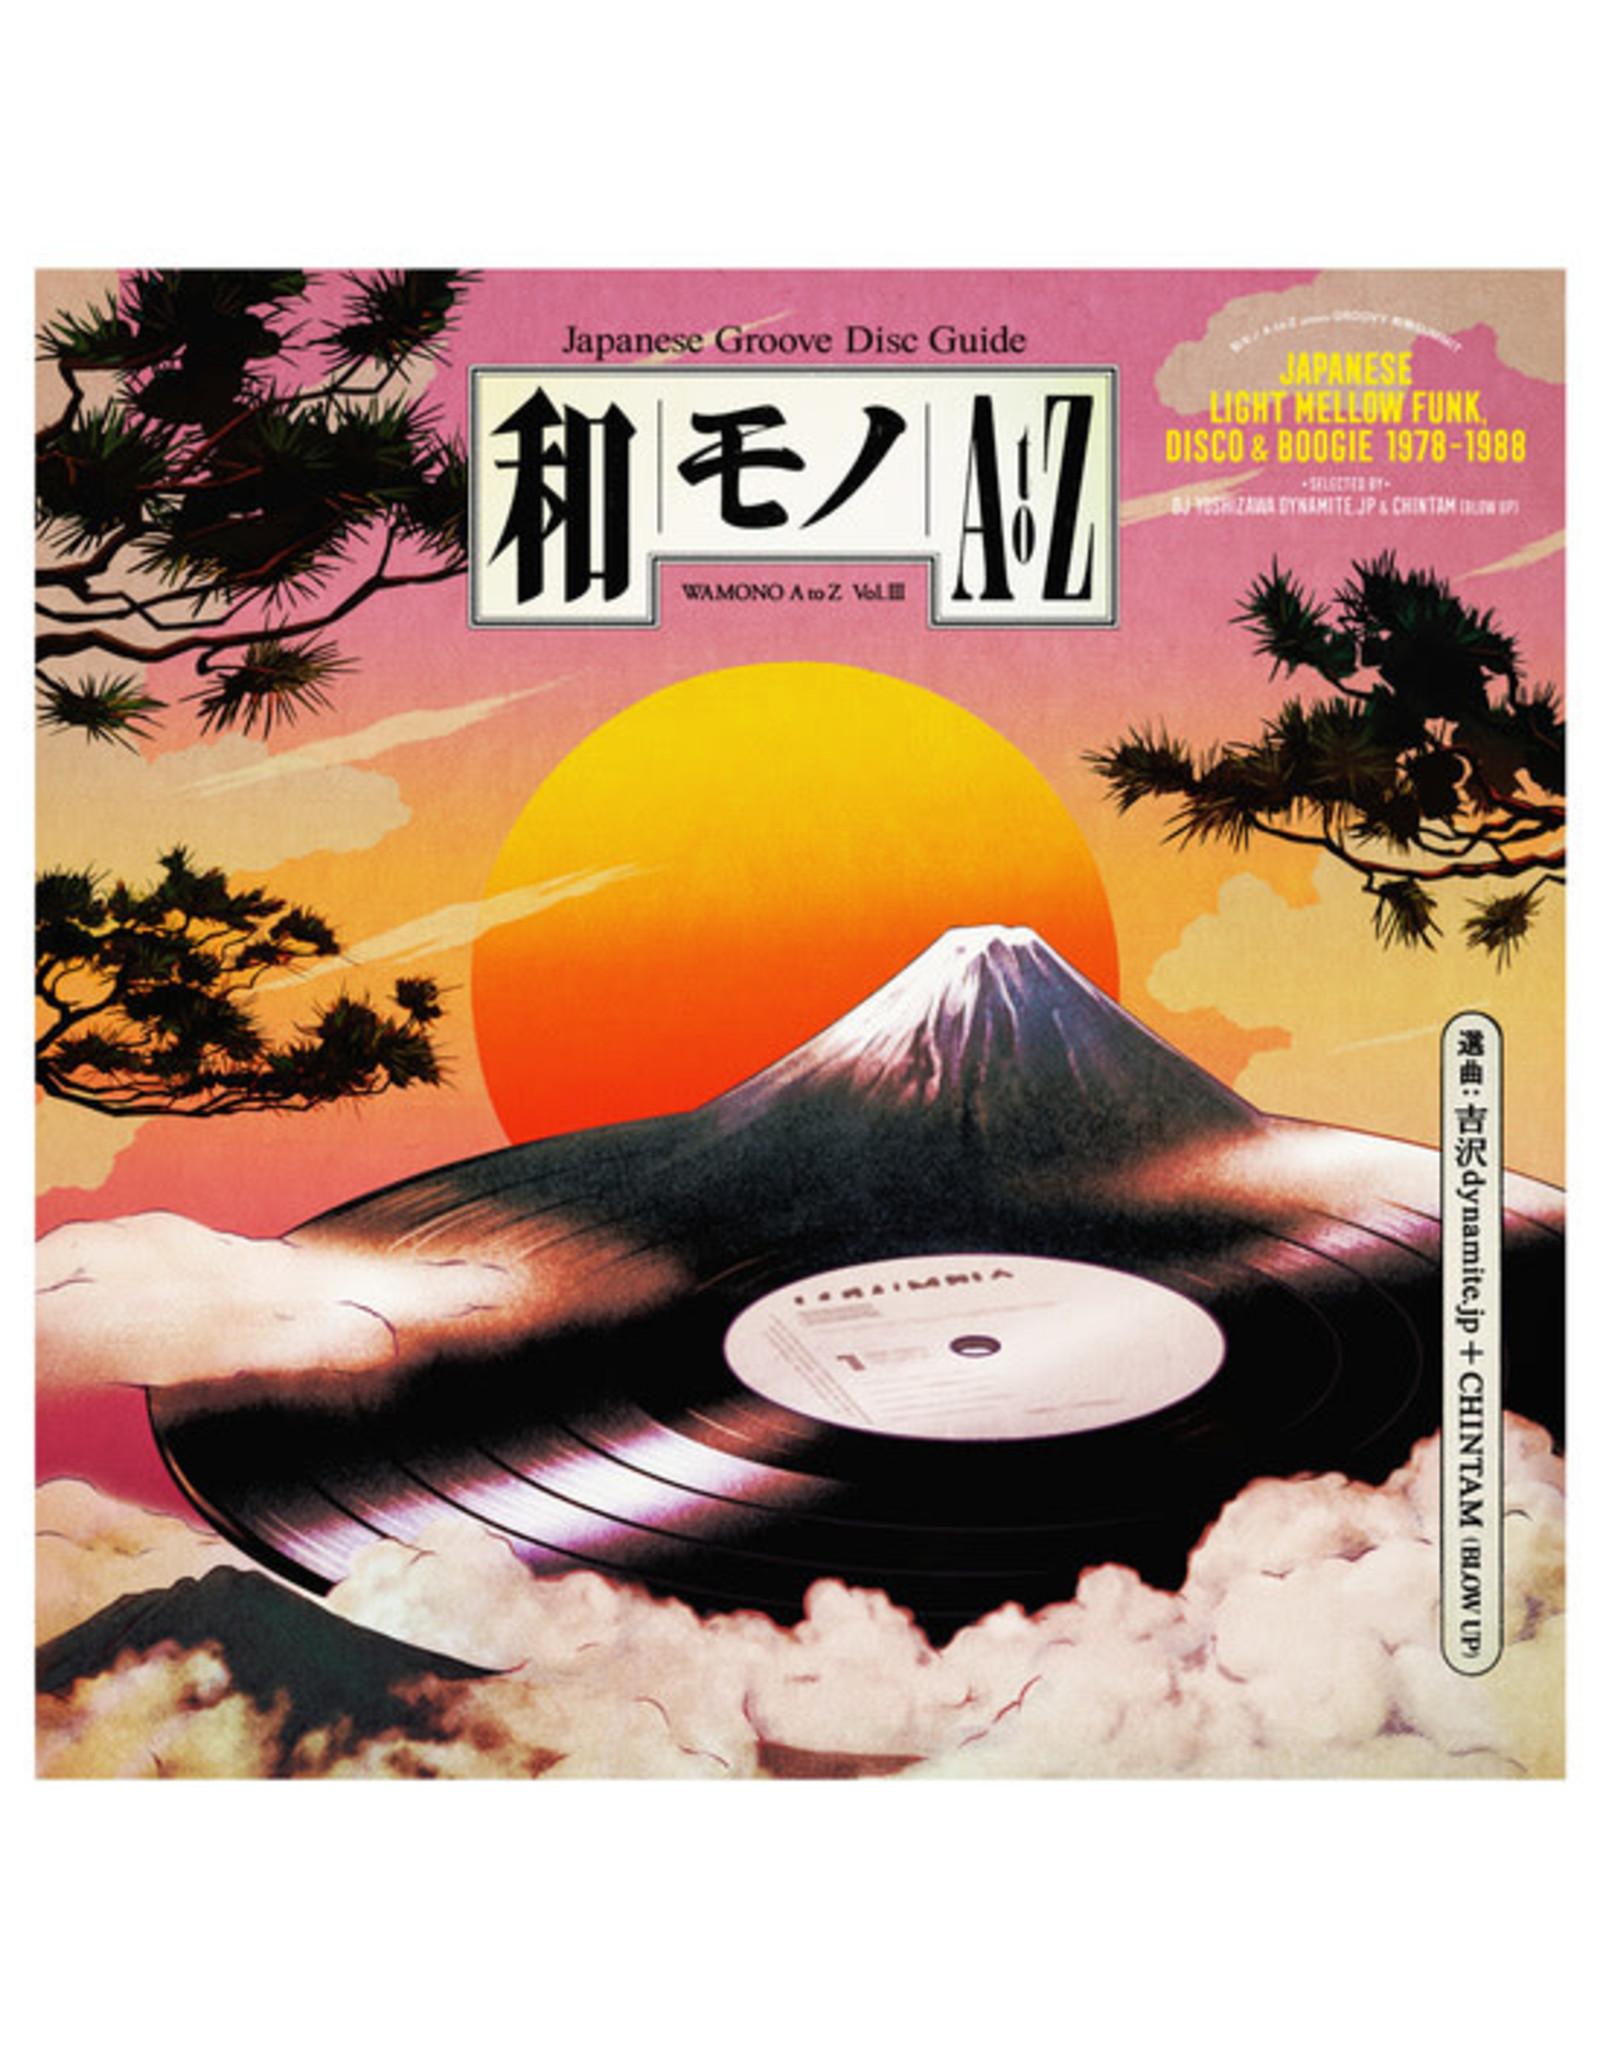 180g Various: Wamono A to Z Vol. III - Japanese Light Mellow Funk, Disco & Boogie 1978-1988 LP